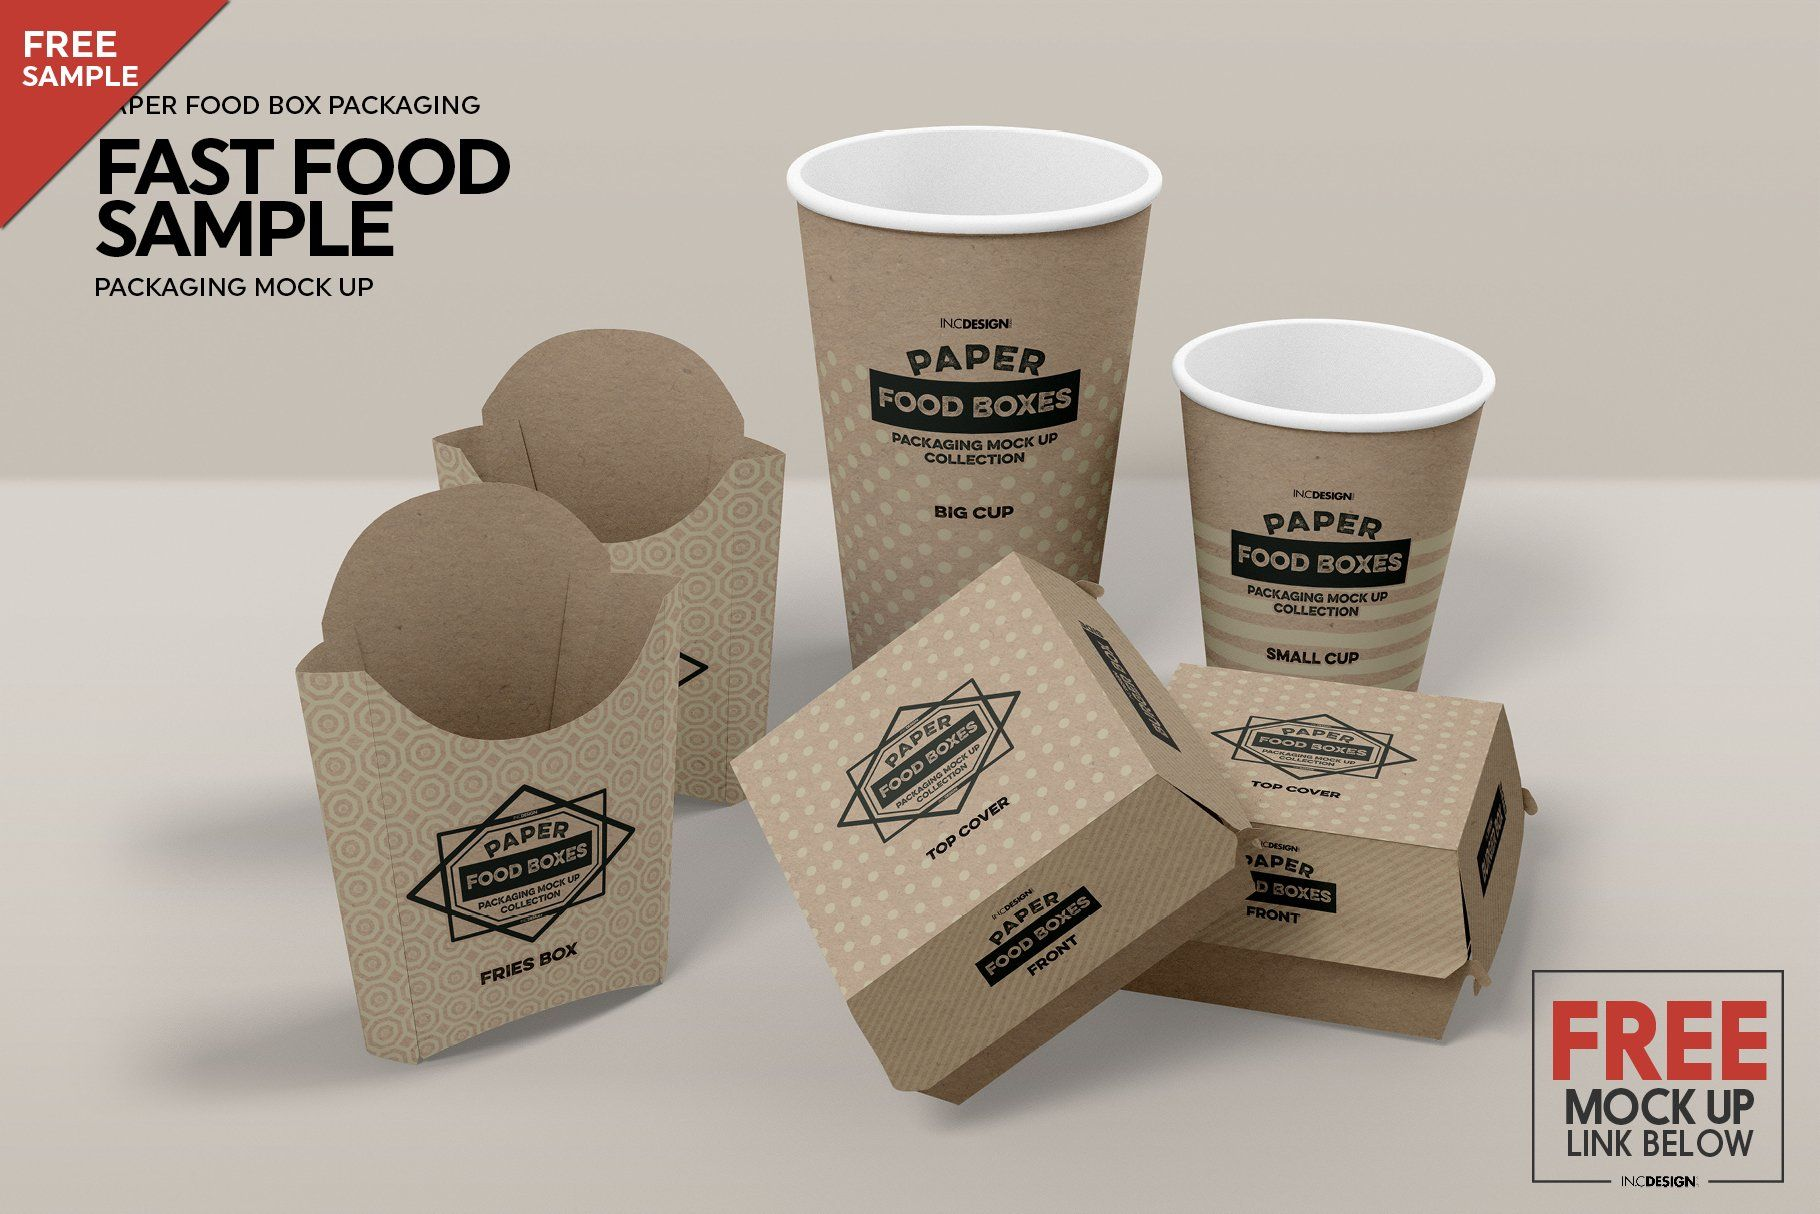 Download Salad Food Box Packaging Mockup Packaging Mockup Free Fast Food Food Packaging